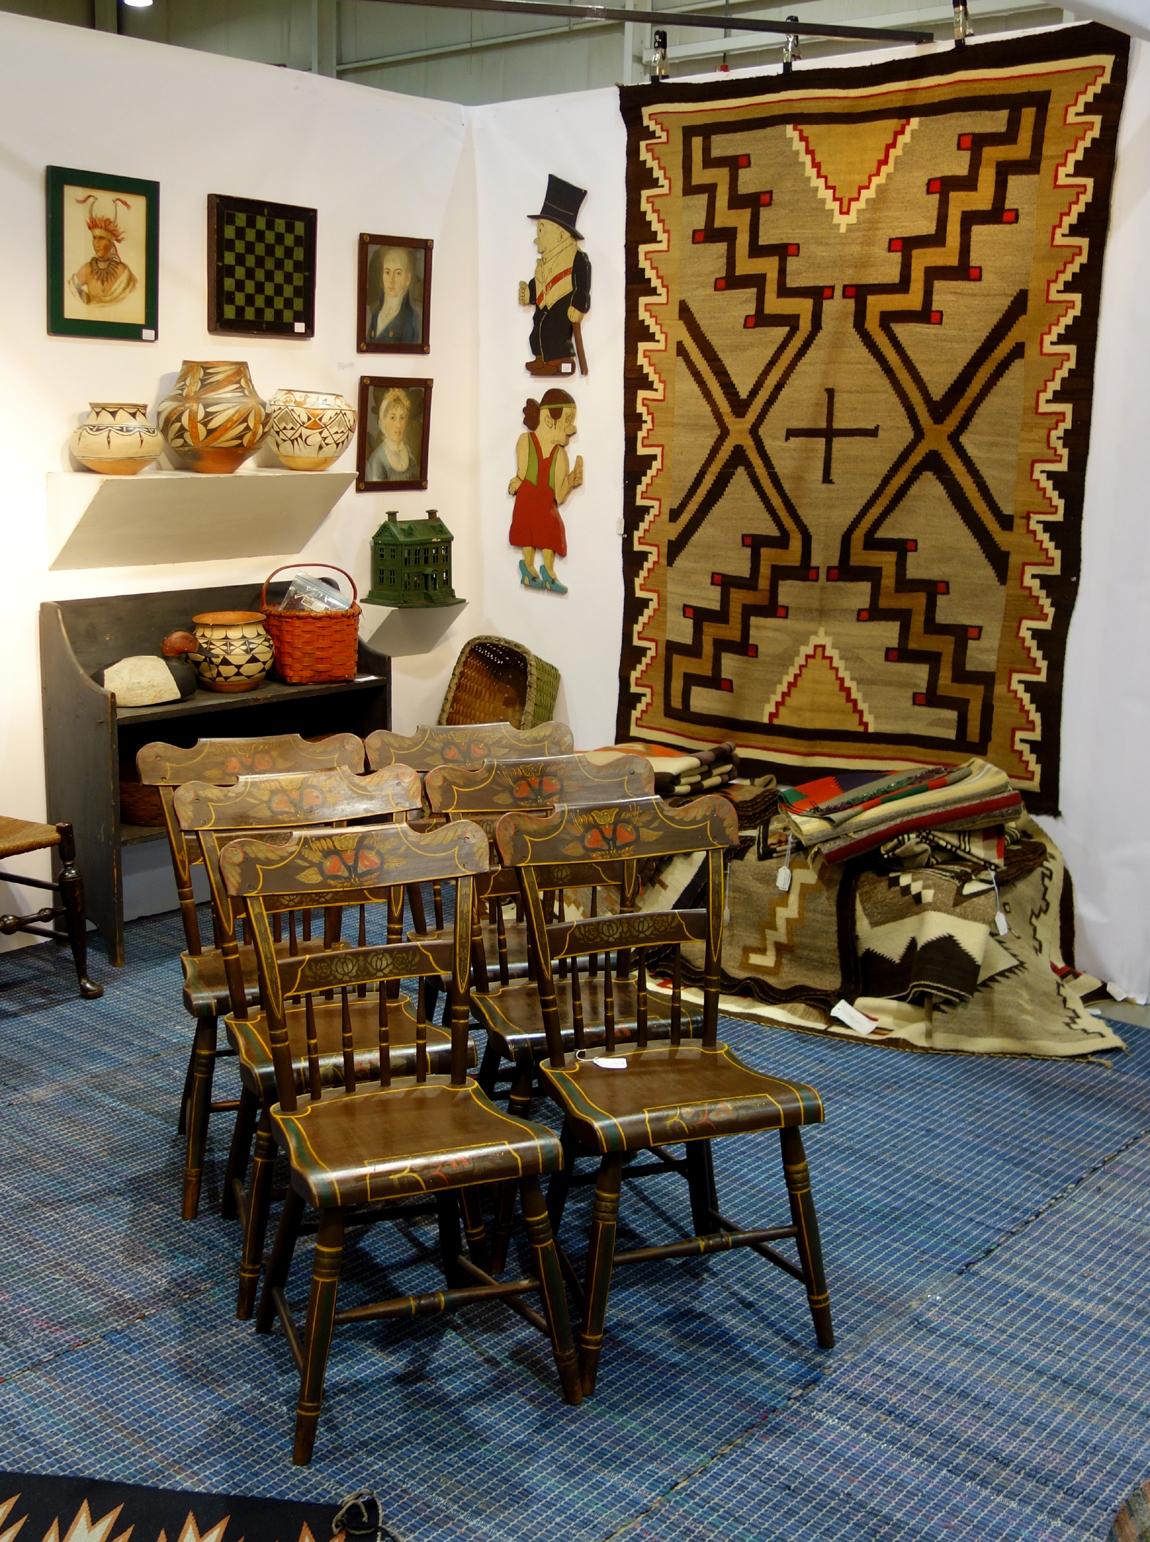 Steve Smoot Antiques & Navajo Textiles, Lancaster, Penn.